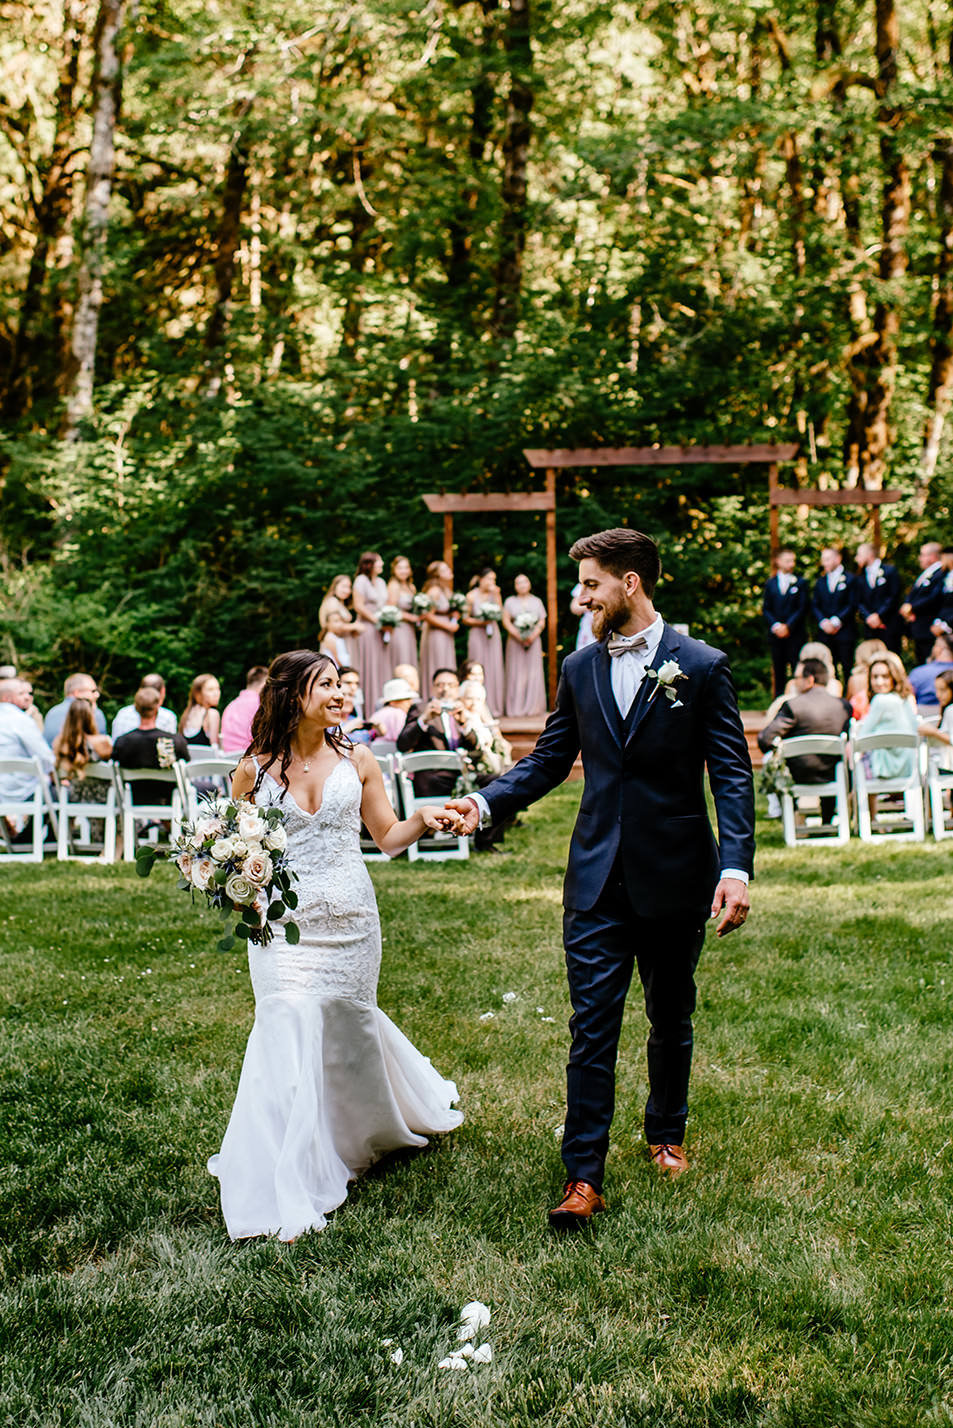 Silver-falls-state-park-wedding-83.jpg